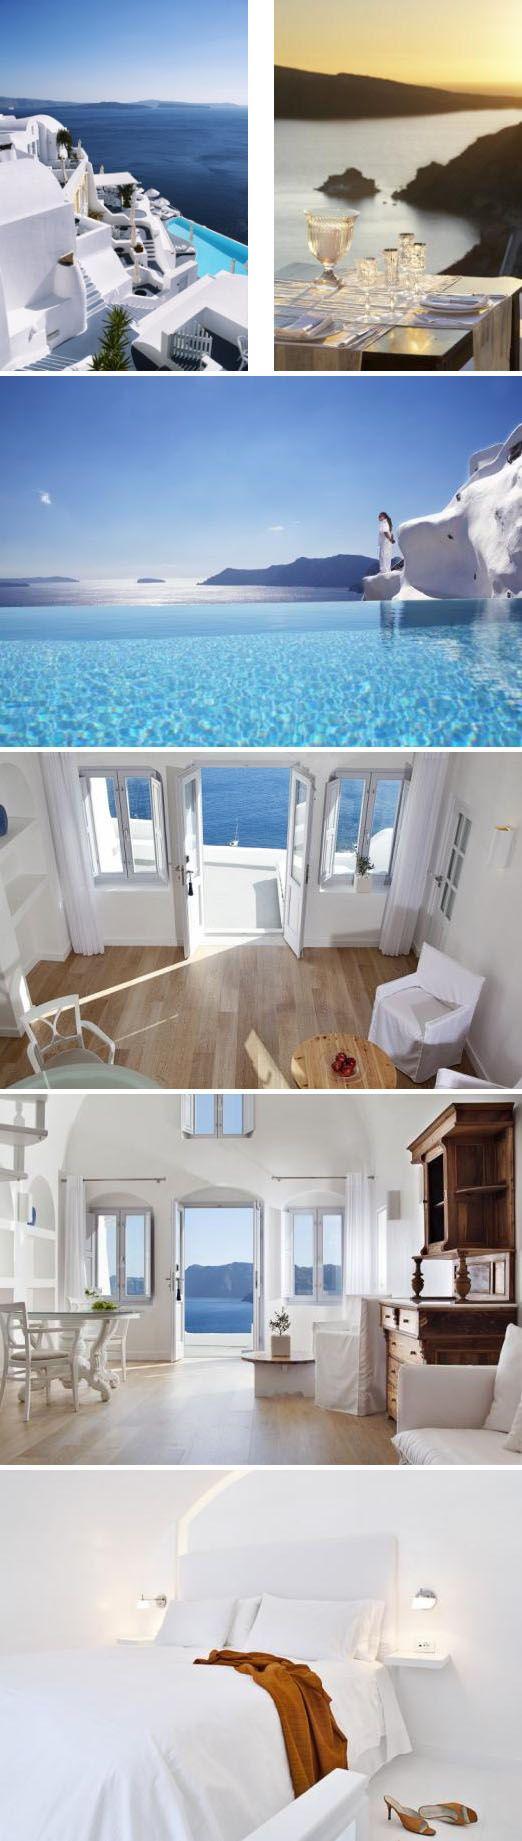 Greece honeymoon destinations pinterest greece for Honeymoon packages santorini greece